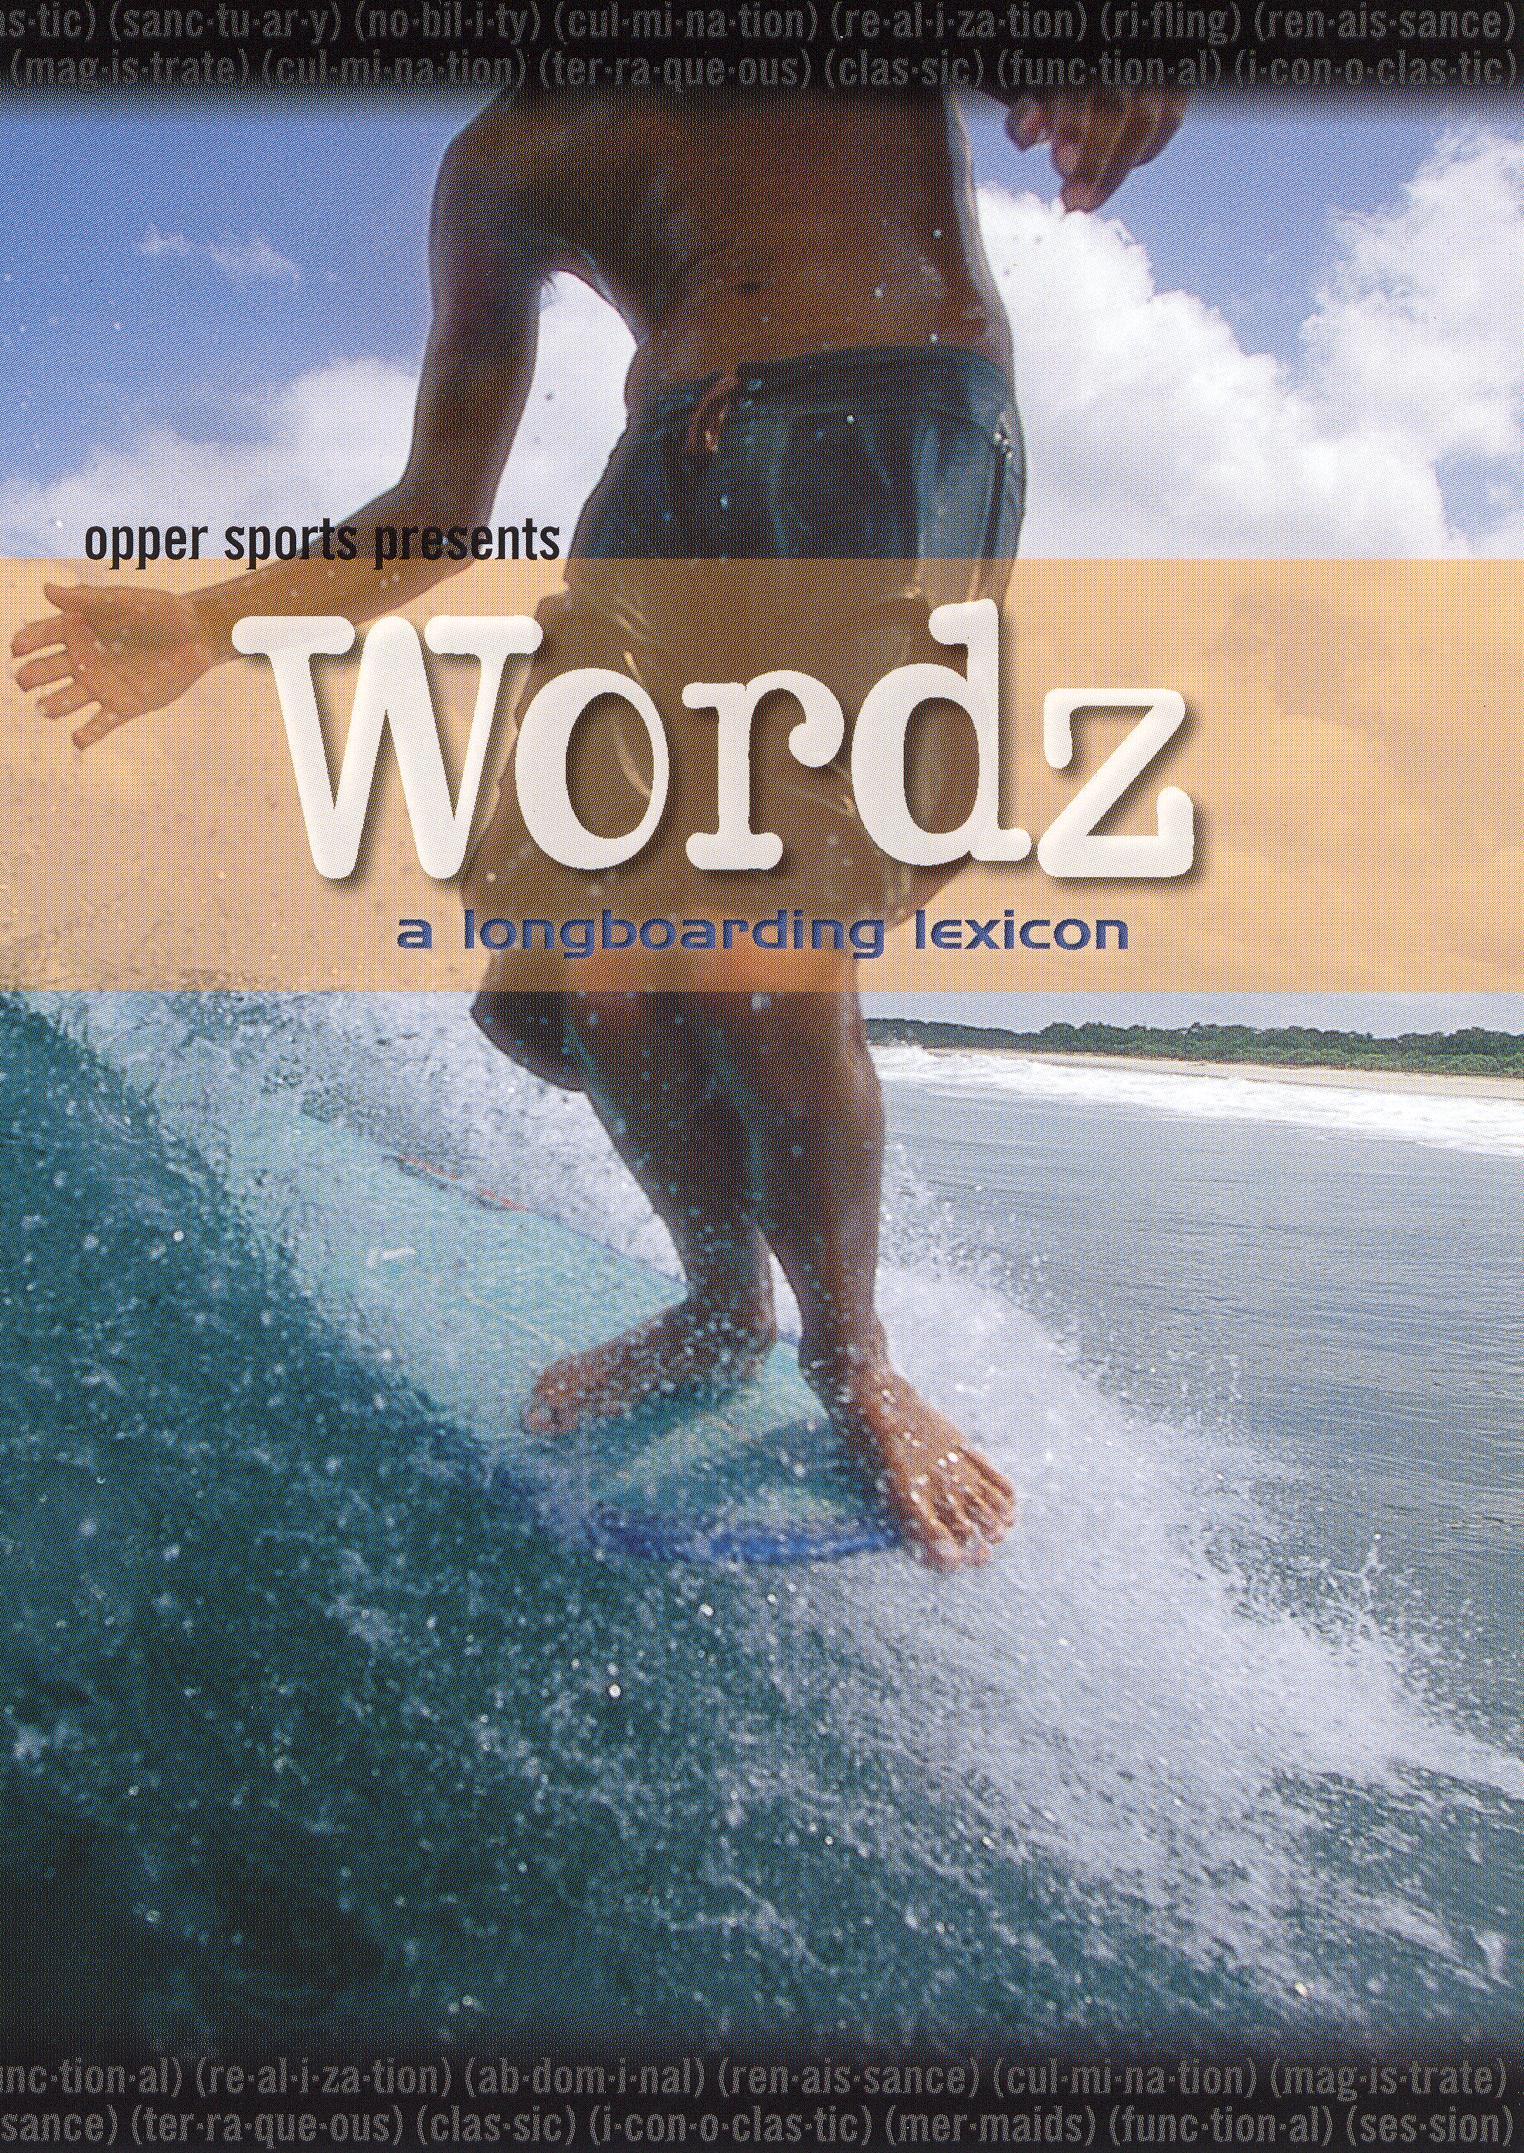 Wordz: A Longboarding Lexicon